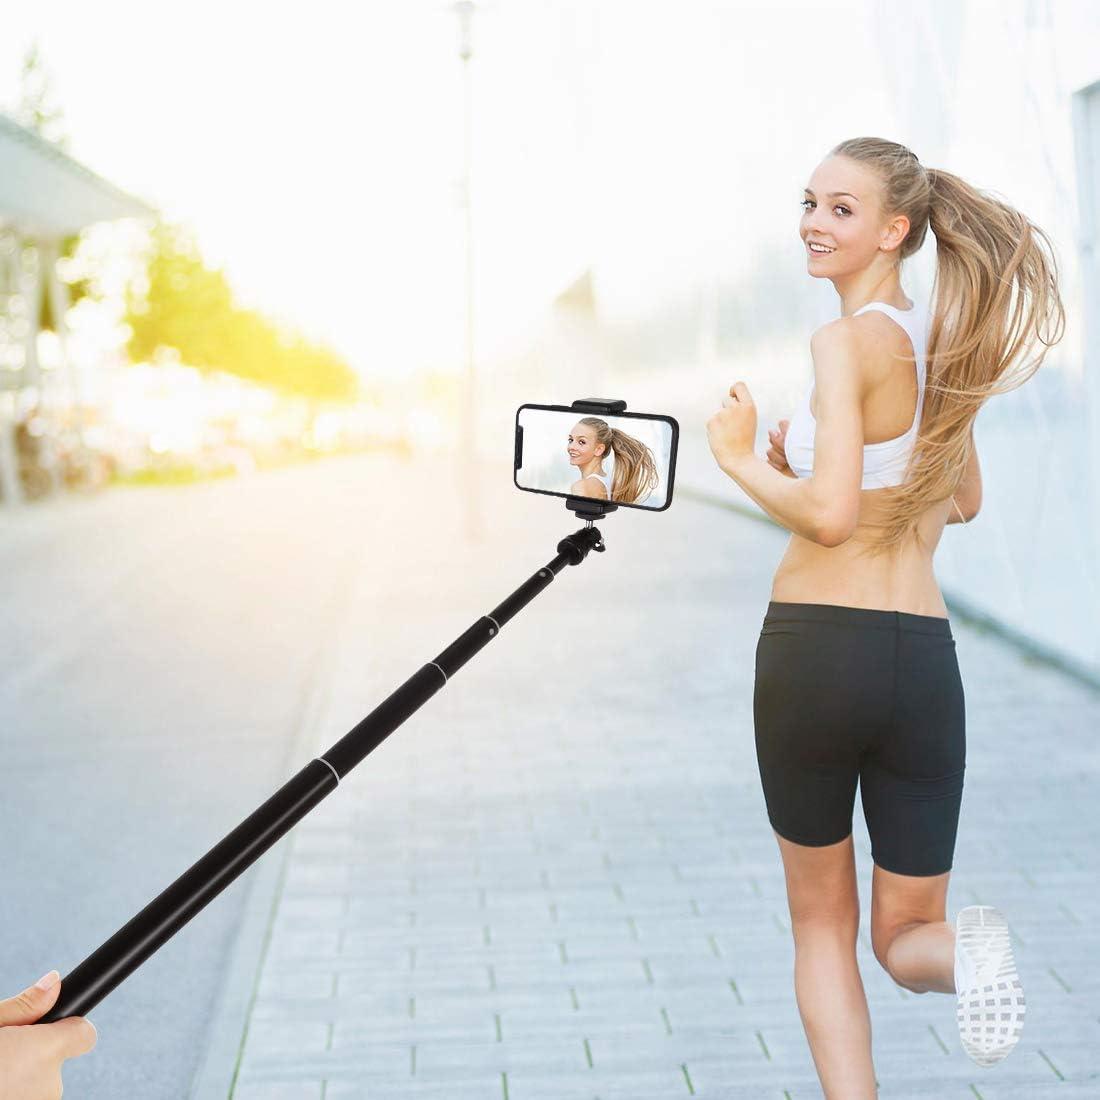 PULUZ Light Stand 1.6m Height Tripod Mount Holder for Vlogging Video Light Live Broadcast Kits